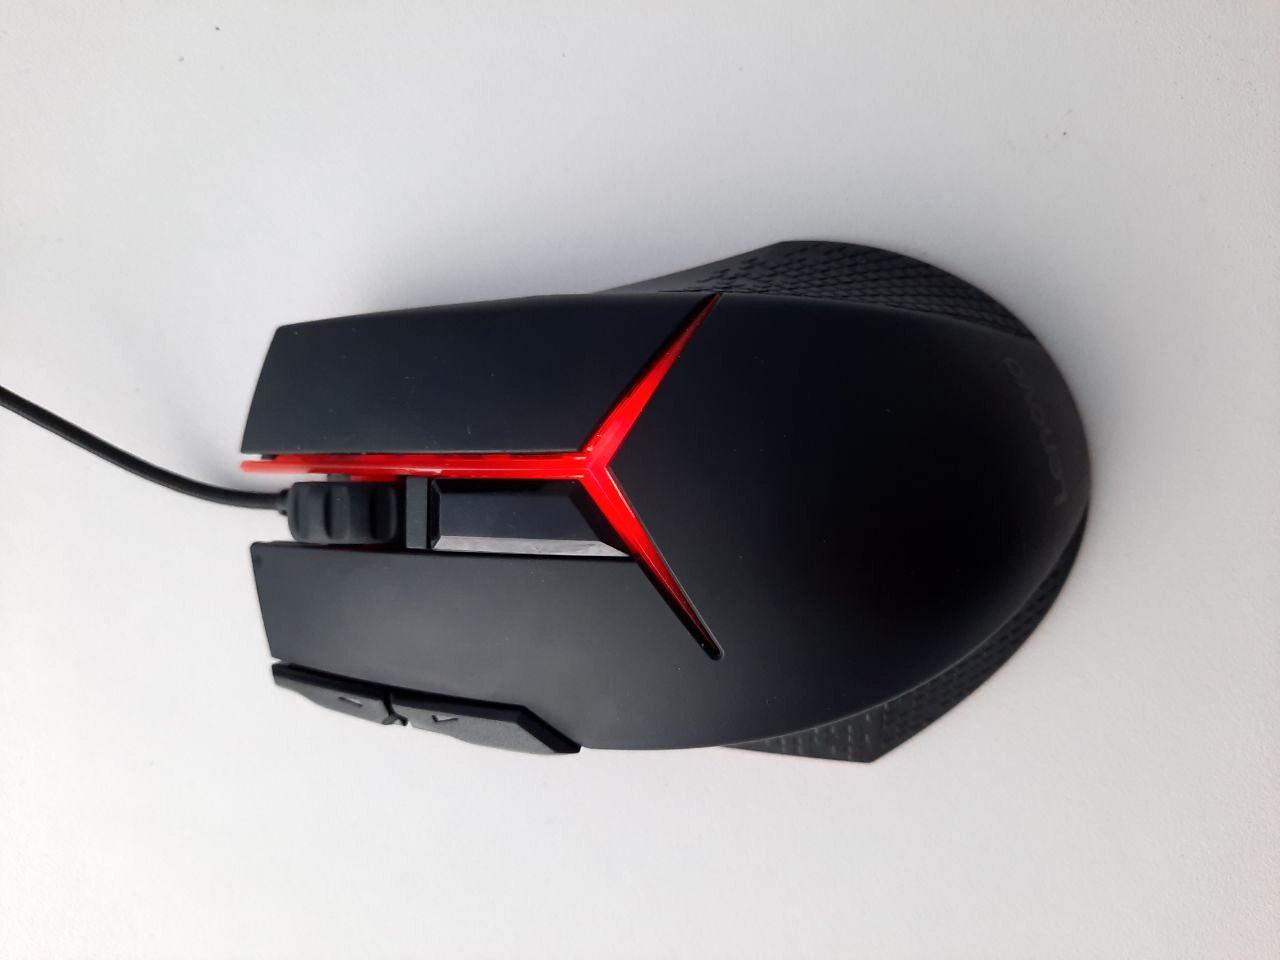 Огляд периферії для геймерів: миша Lenovo Y Gaming Precision Mouse та гарнітура Lenovo Legion H300 Gaming Headset